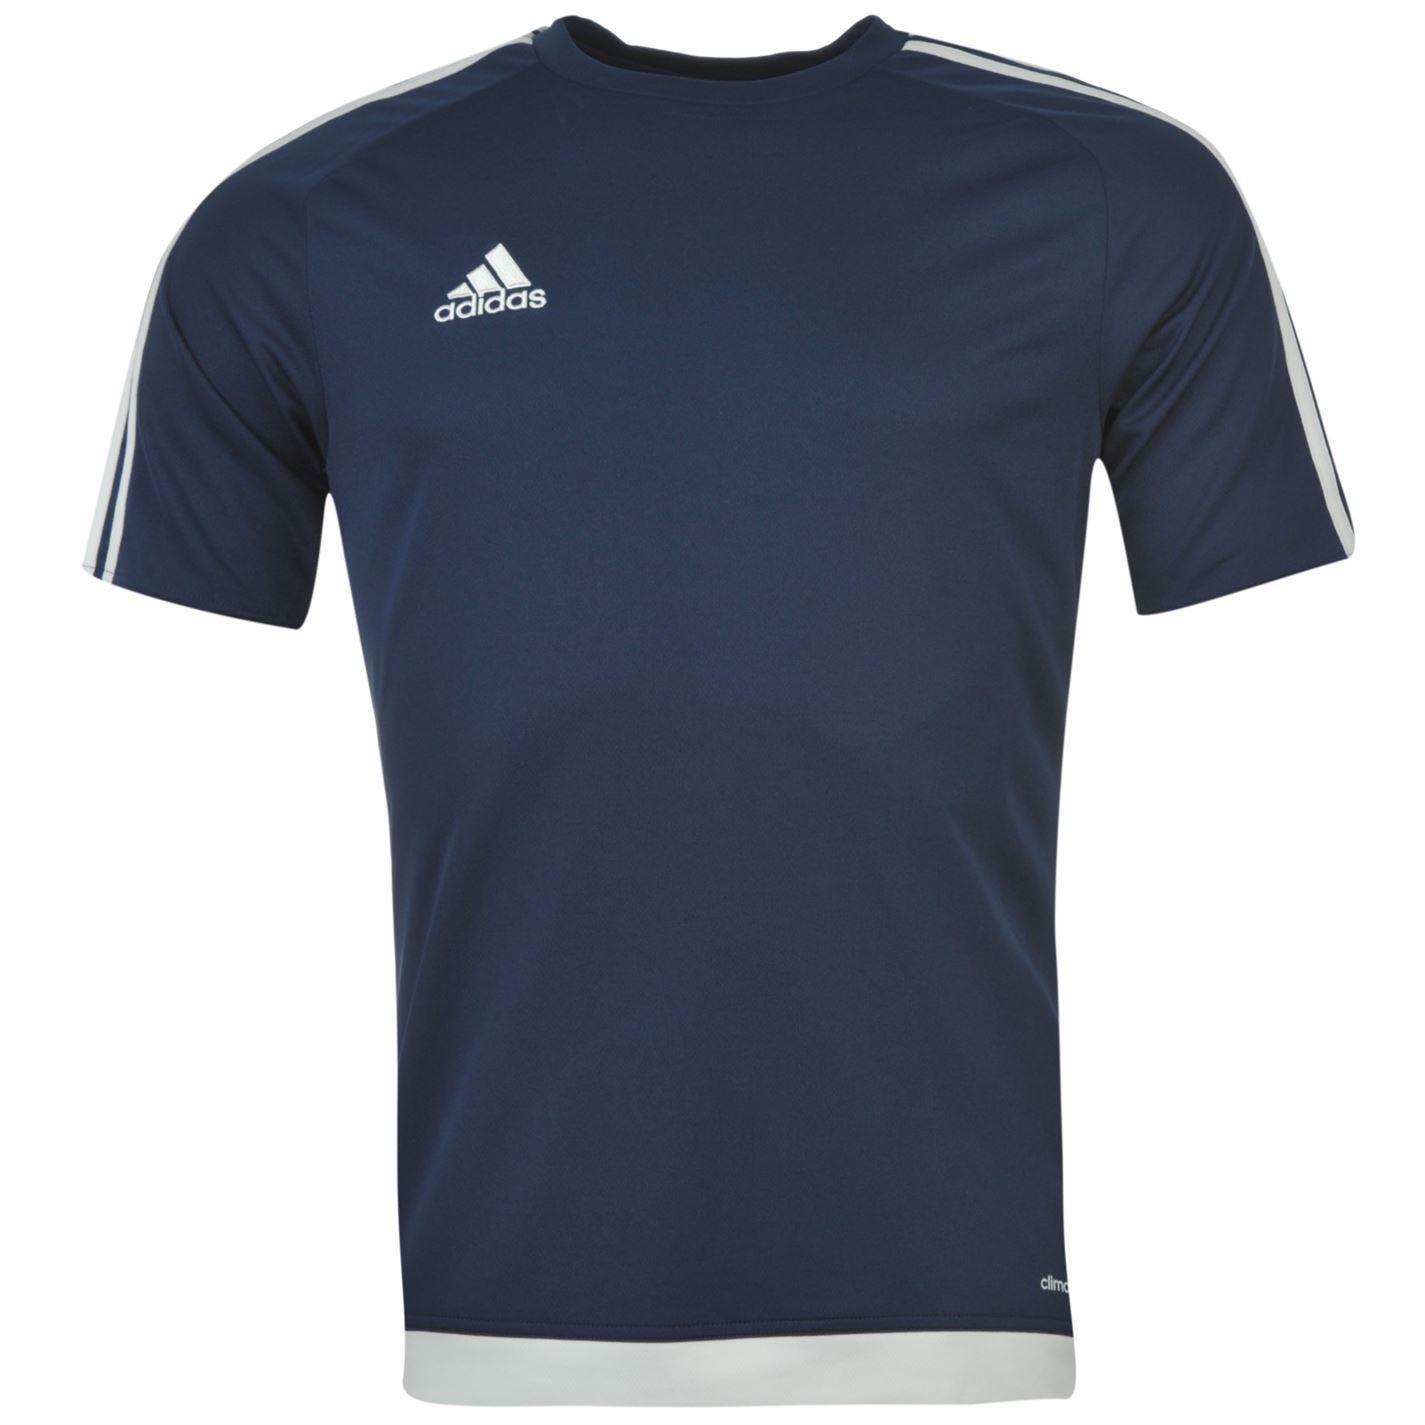 Details about Adidas 3 Stripe Estro Climalite T Shirt Mens Dark BlueWhite Sports Top